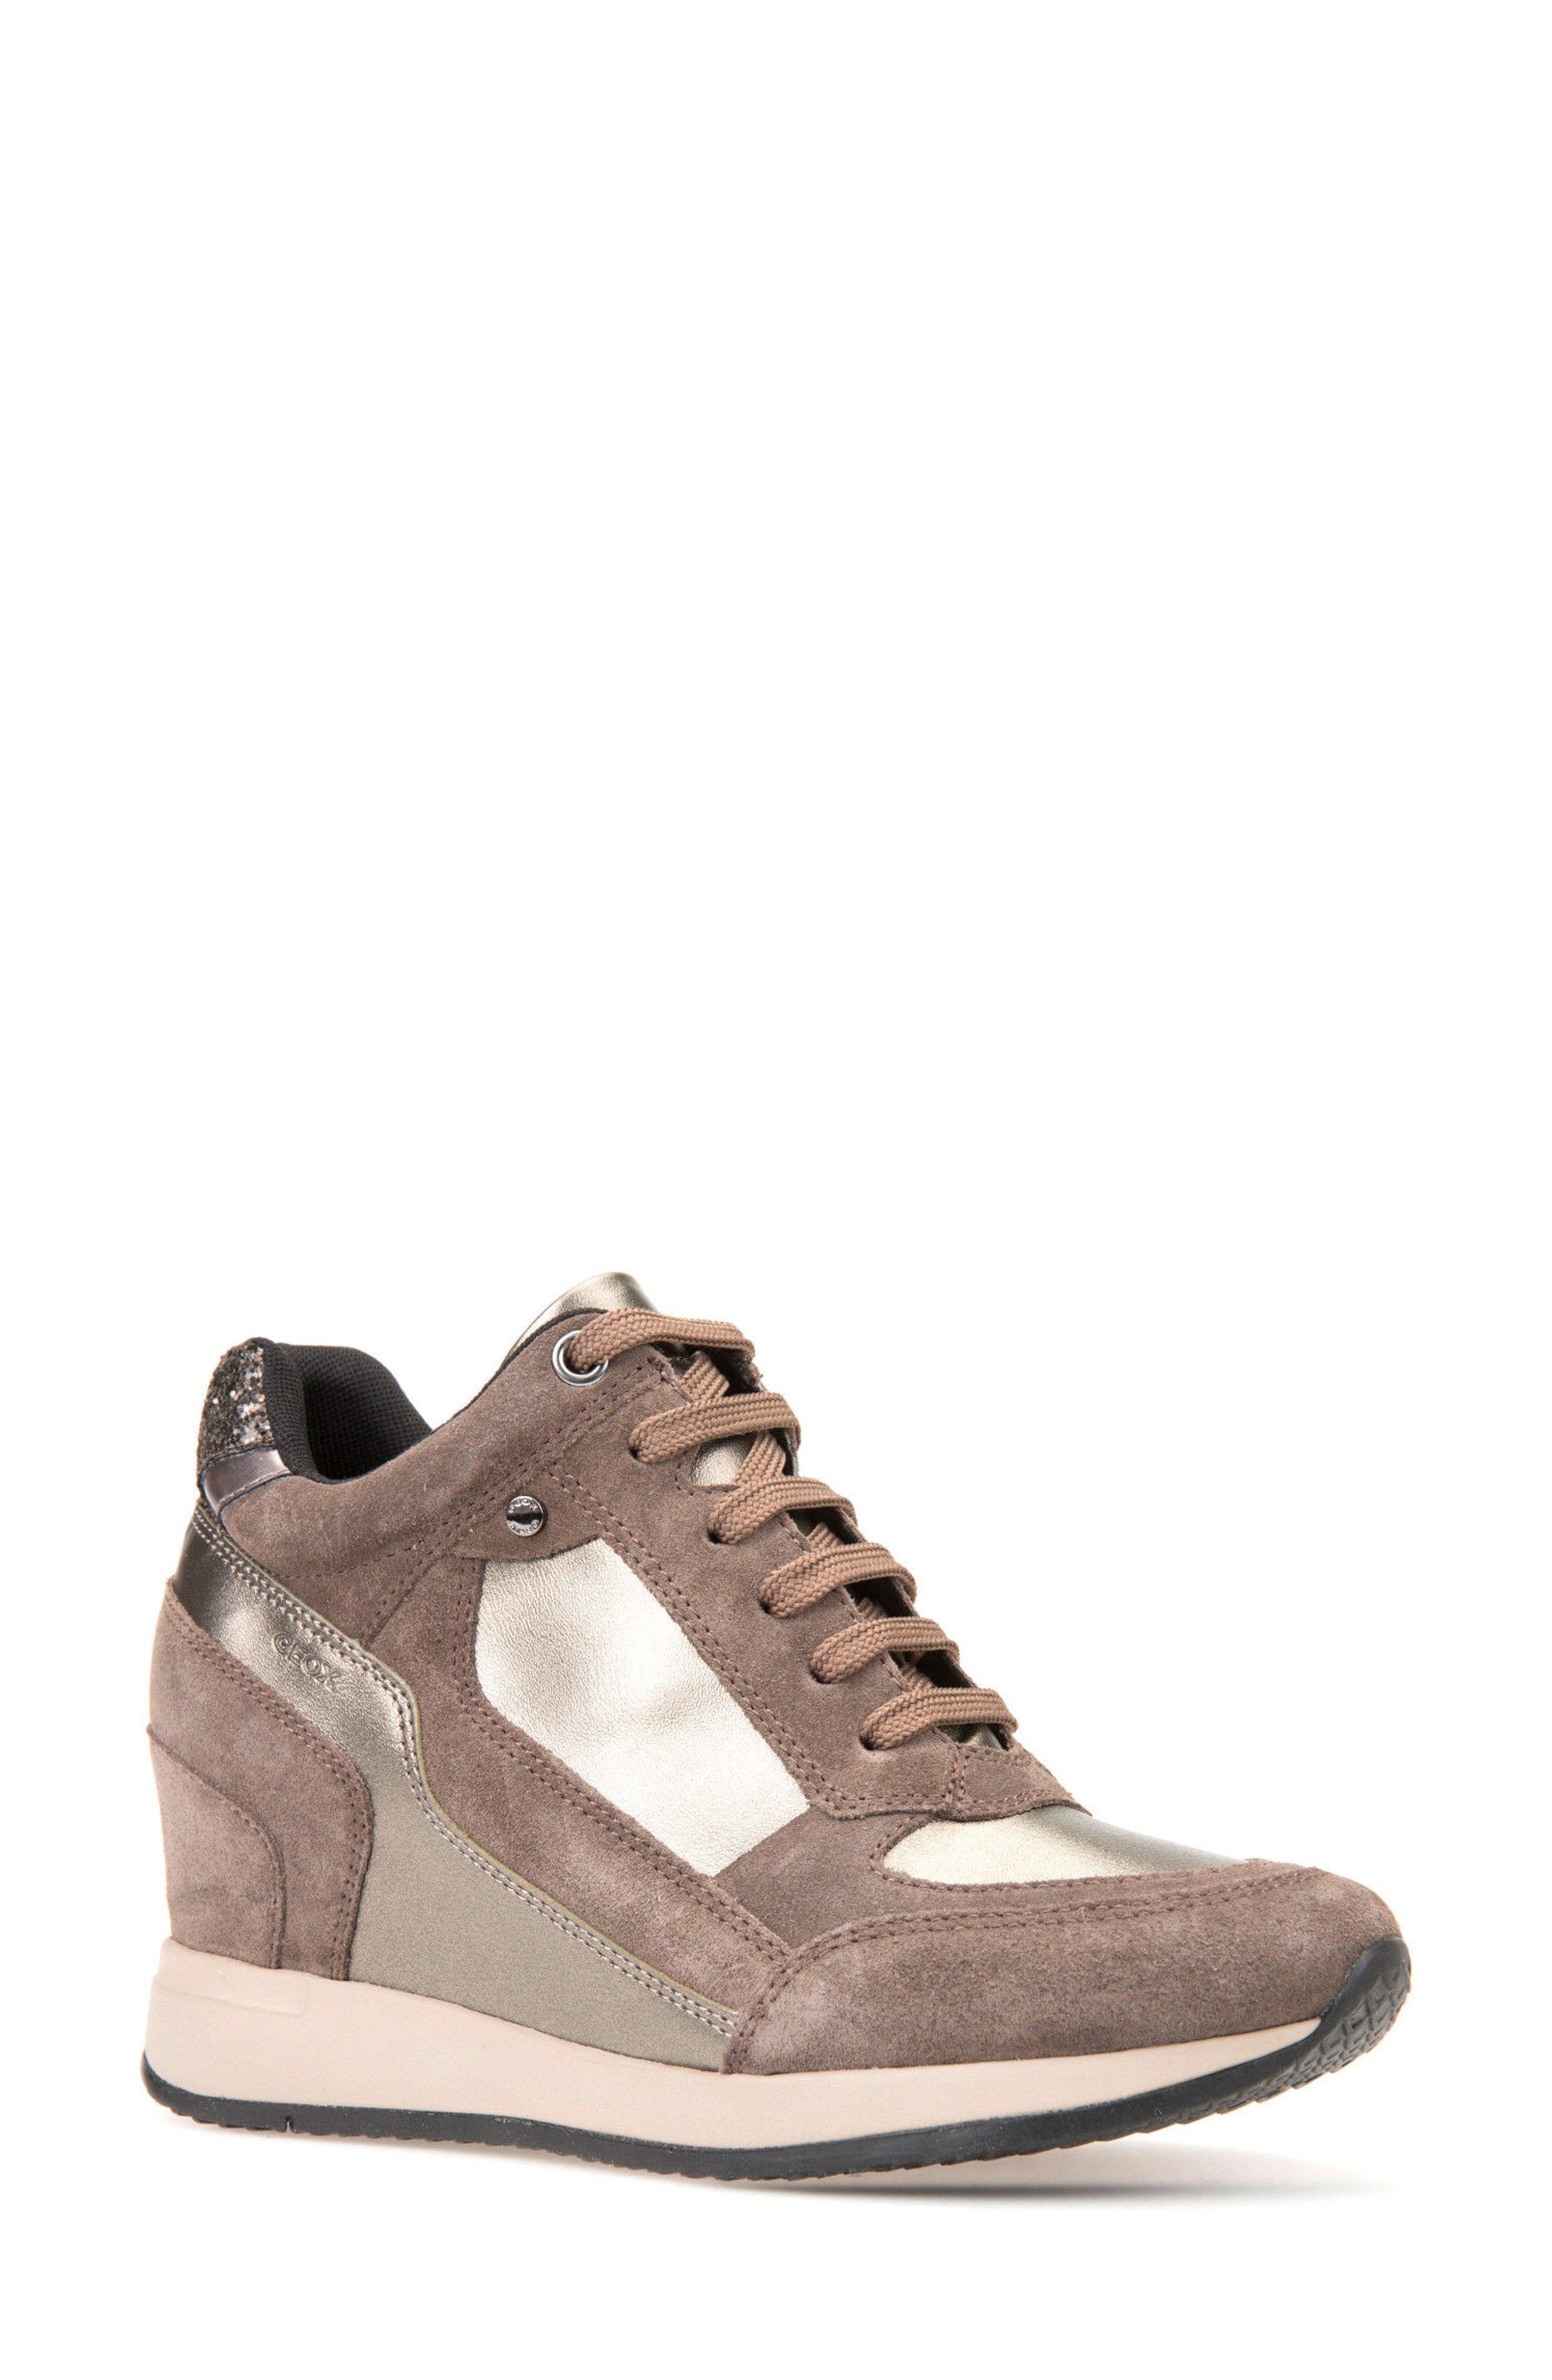 08a5d5ab8d3 Buy GEOX Nydame Wedge Sneaker online. New GEOX Shoes. [$169.95] SKU  UUUT94342SEVP23138